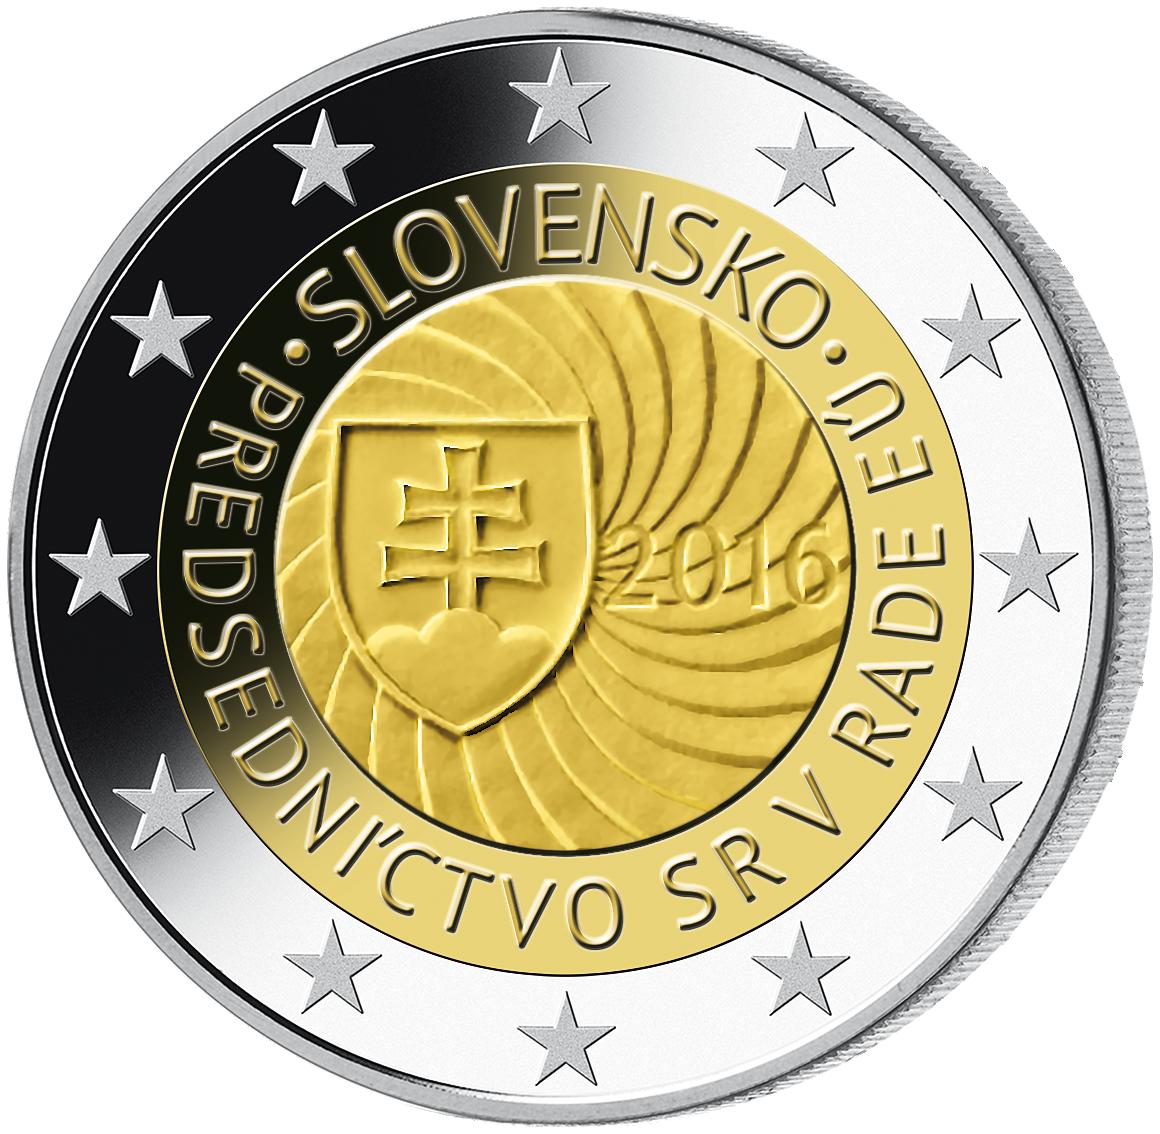 2 Euro Münze Slowakei 1 Eu Ratspräsident 2016 Bfr Münzen Günstigerde